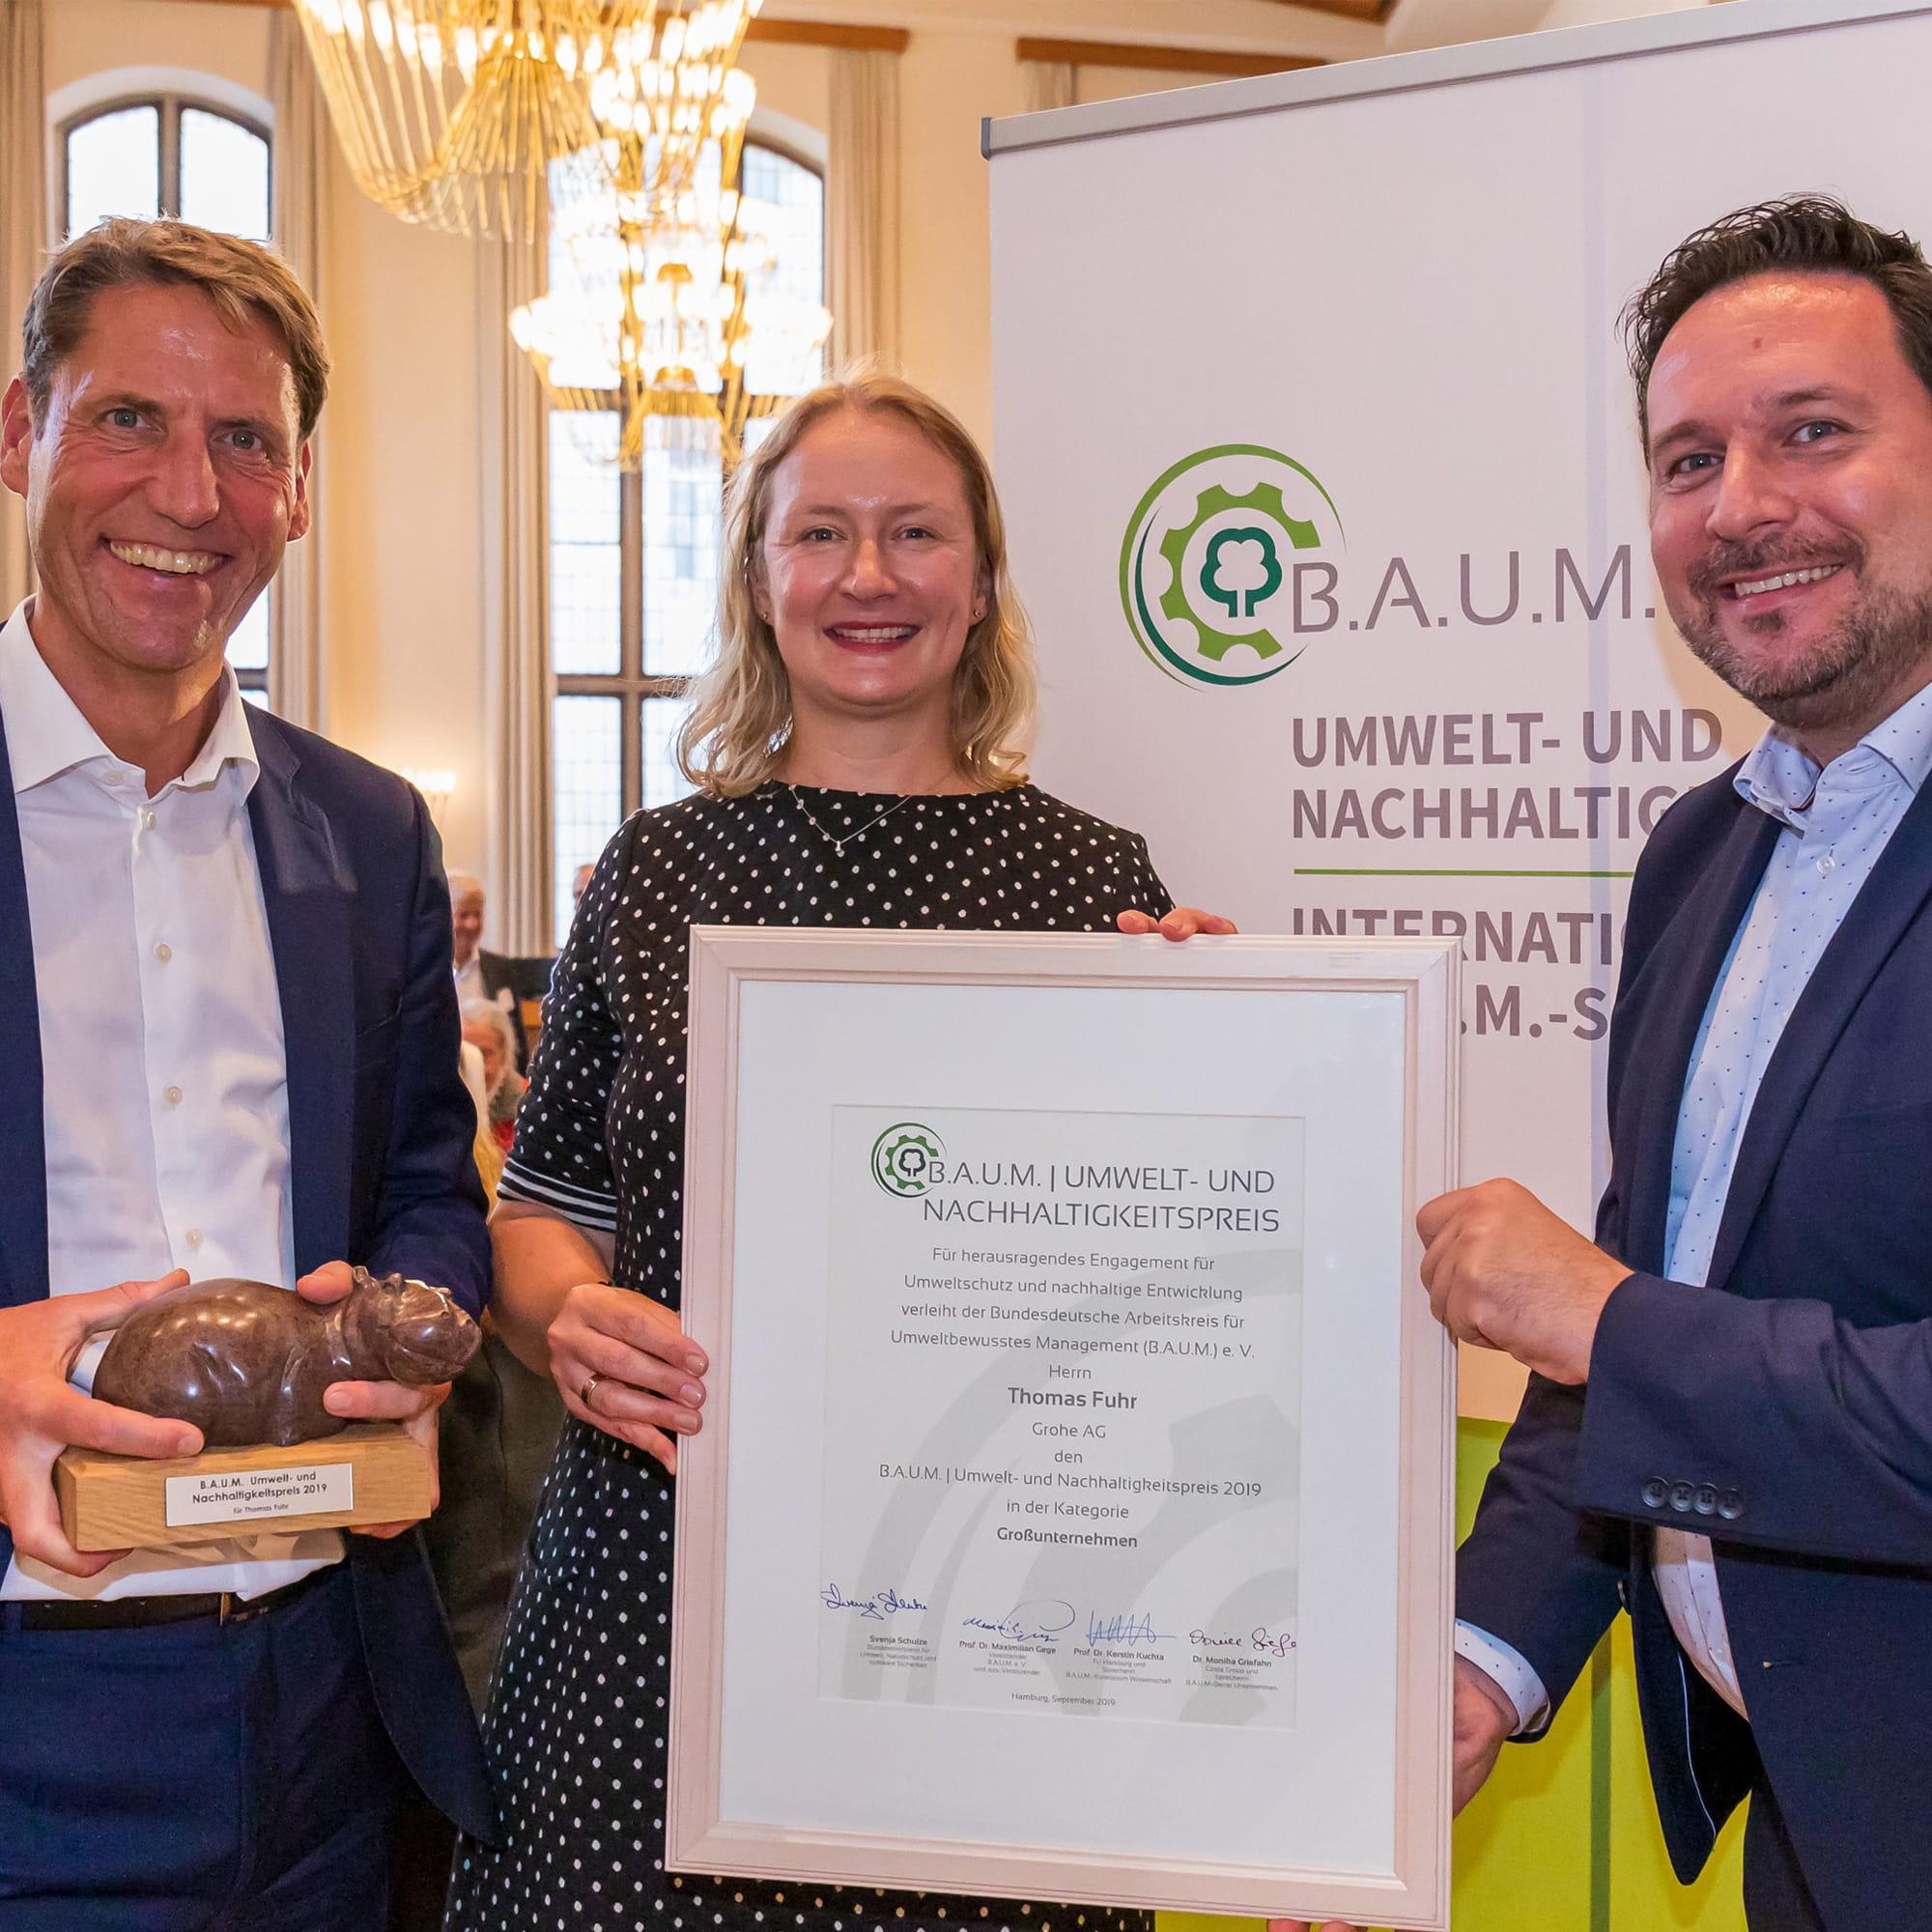 GROHE Sustainability Report Awards